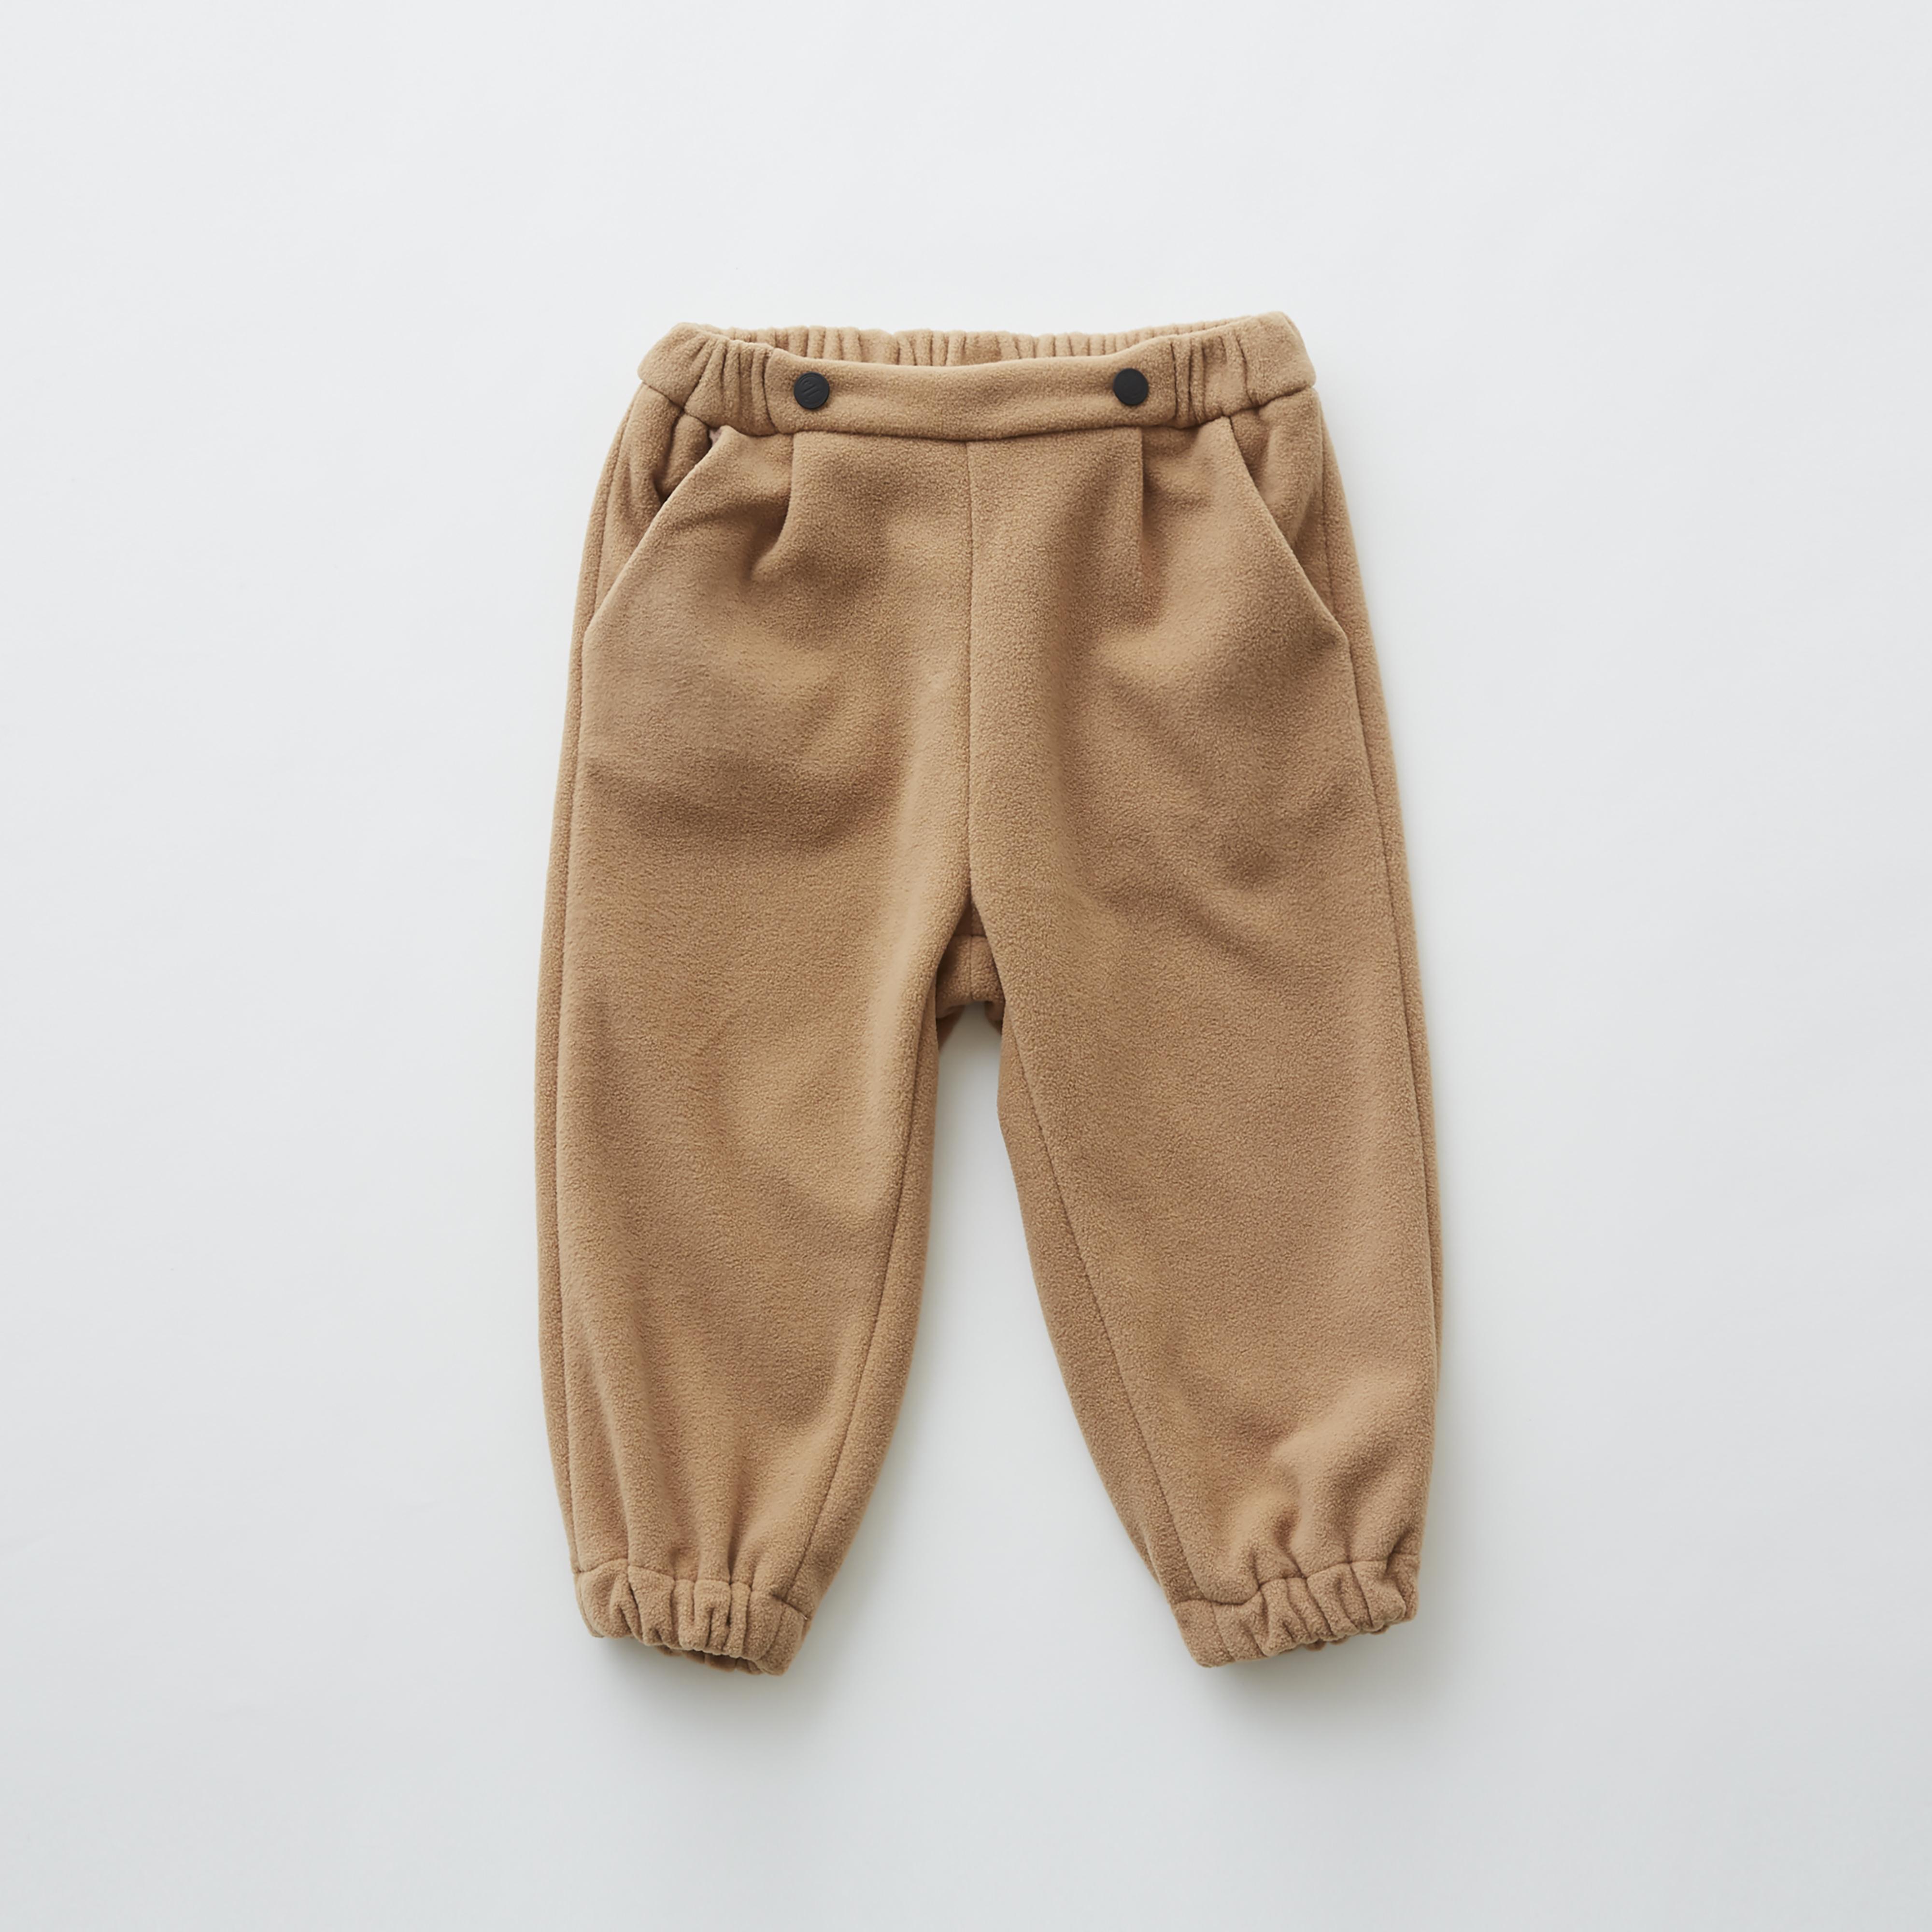 《eLfinFolk 2019AW》freece pants / beige / 80・90・100cm